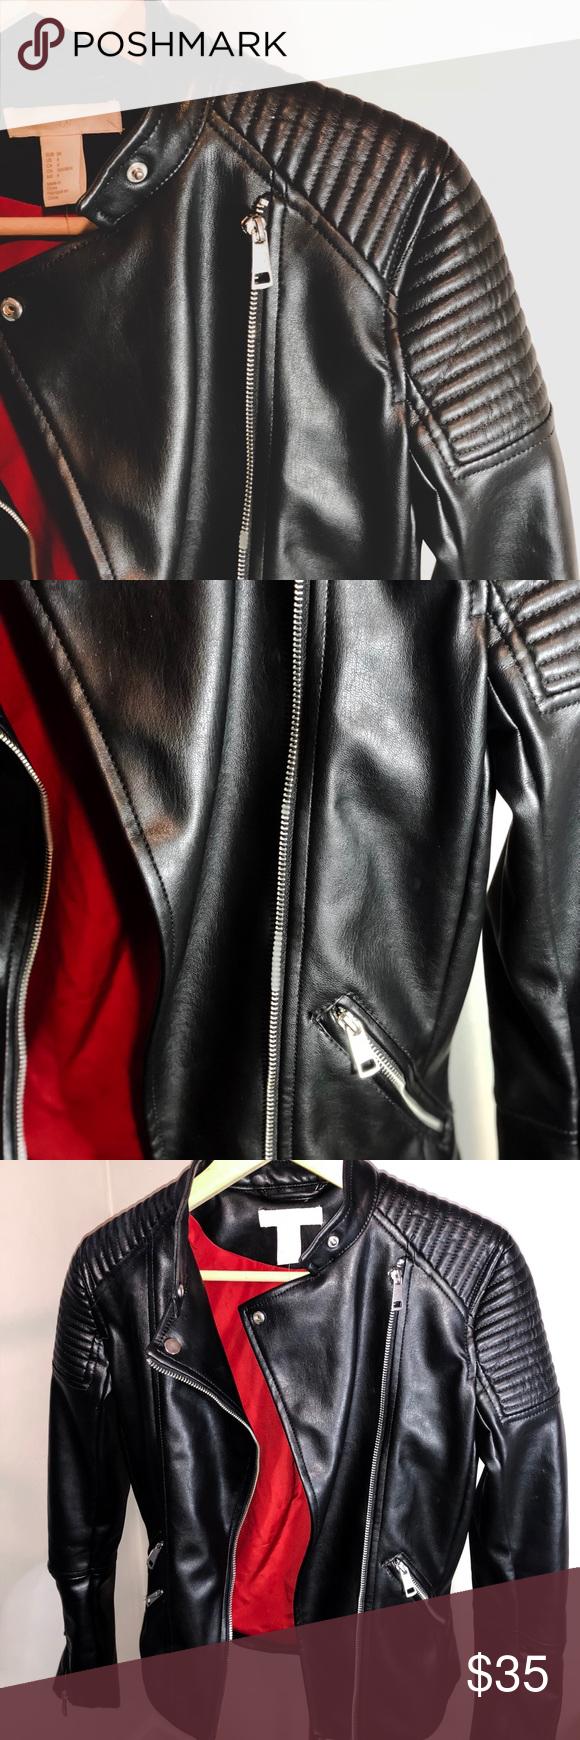 H&M Biker Jacket Biker jacket, Clothes design, H&m jackets